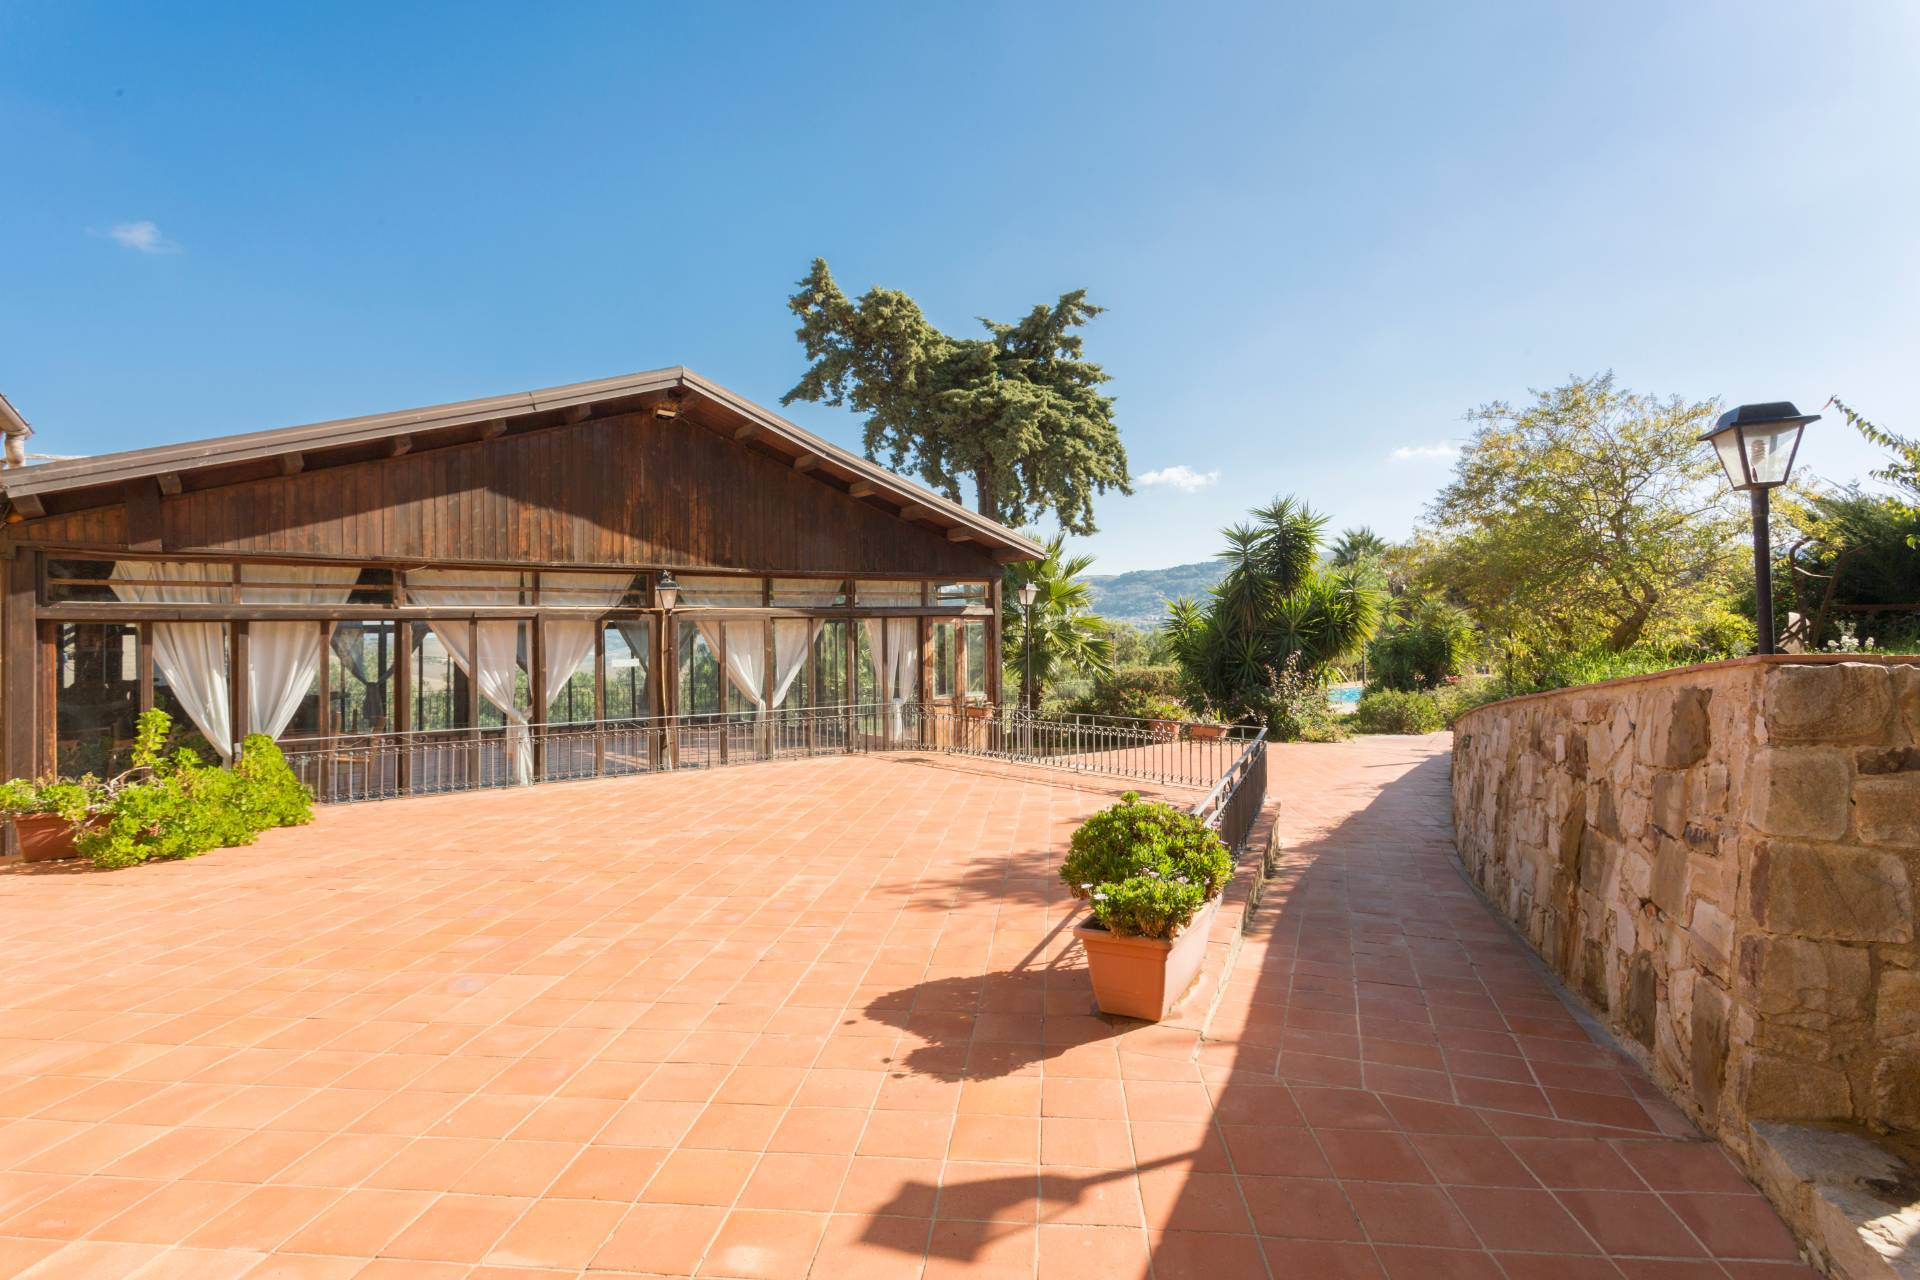 Villa in Vendita a Piazza Armerina: 5 locali, 550 mq - Foto 17